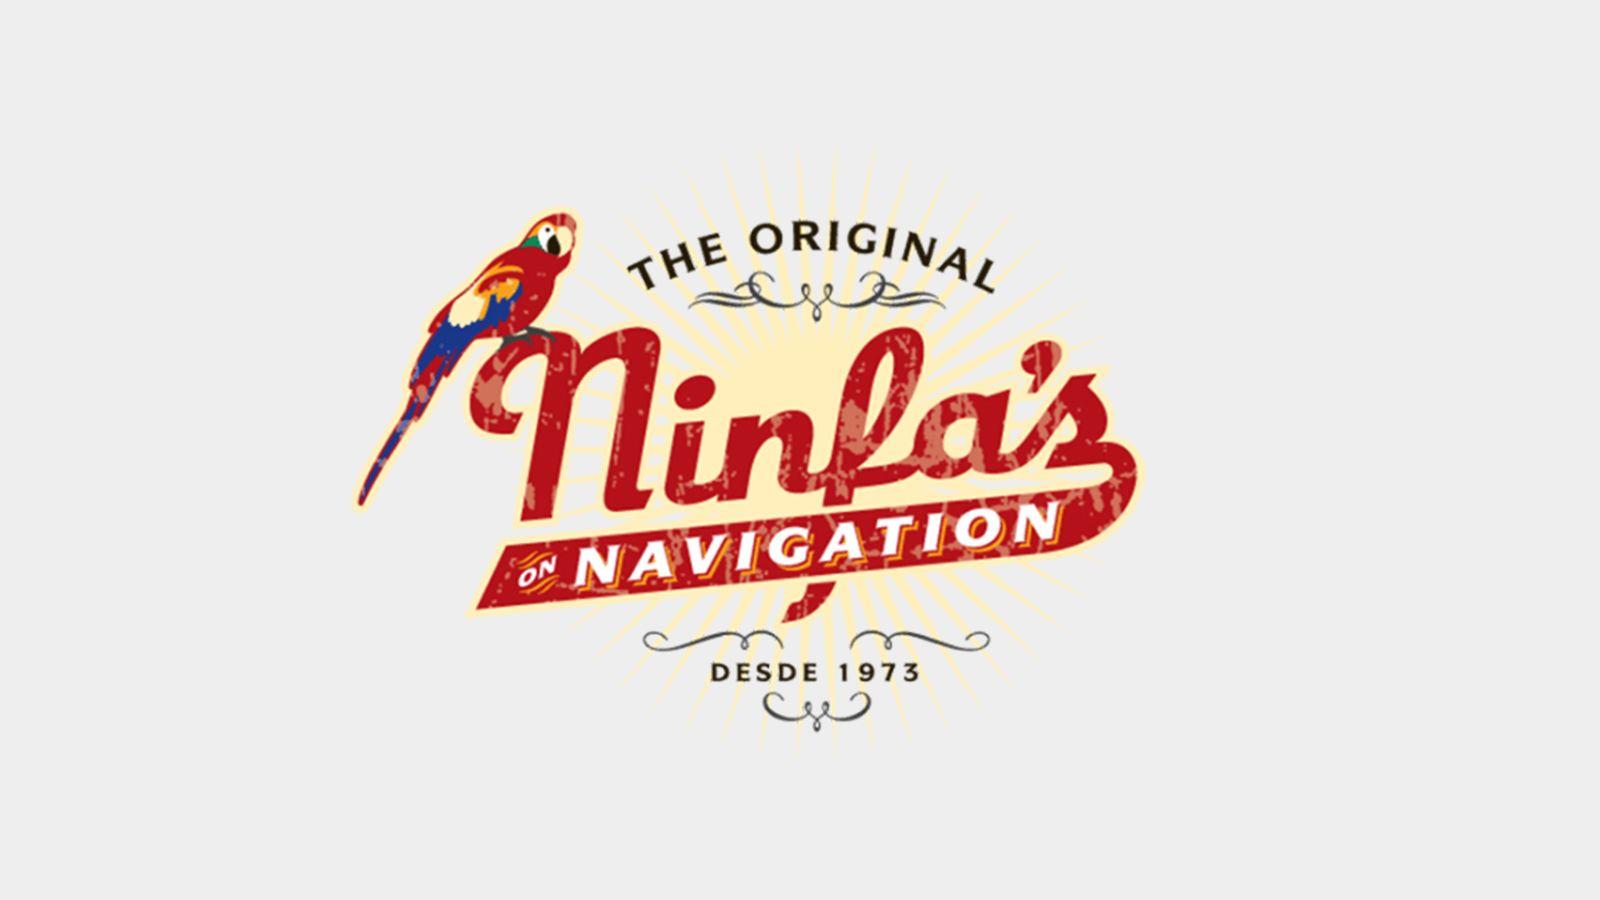 The Original Ninfa's